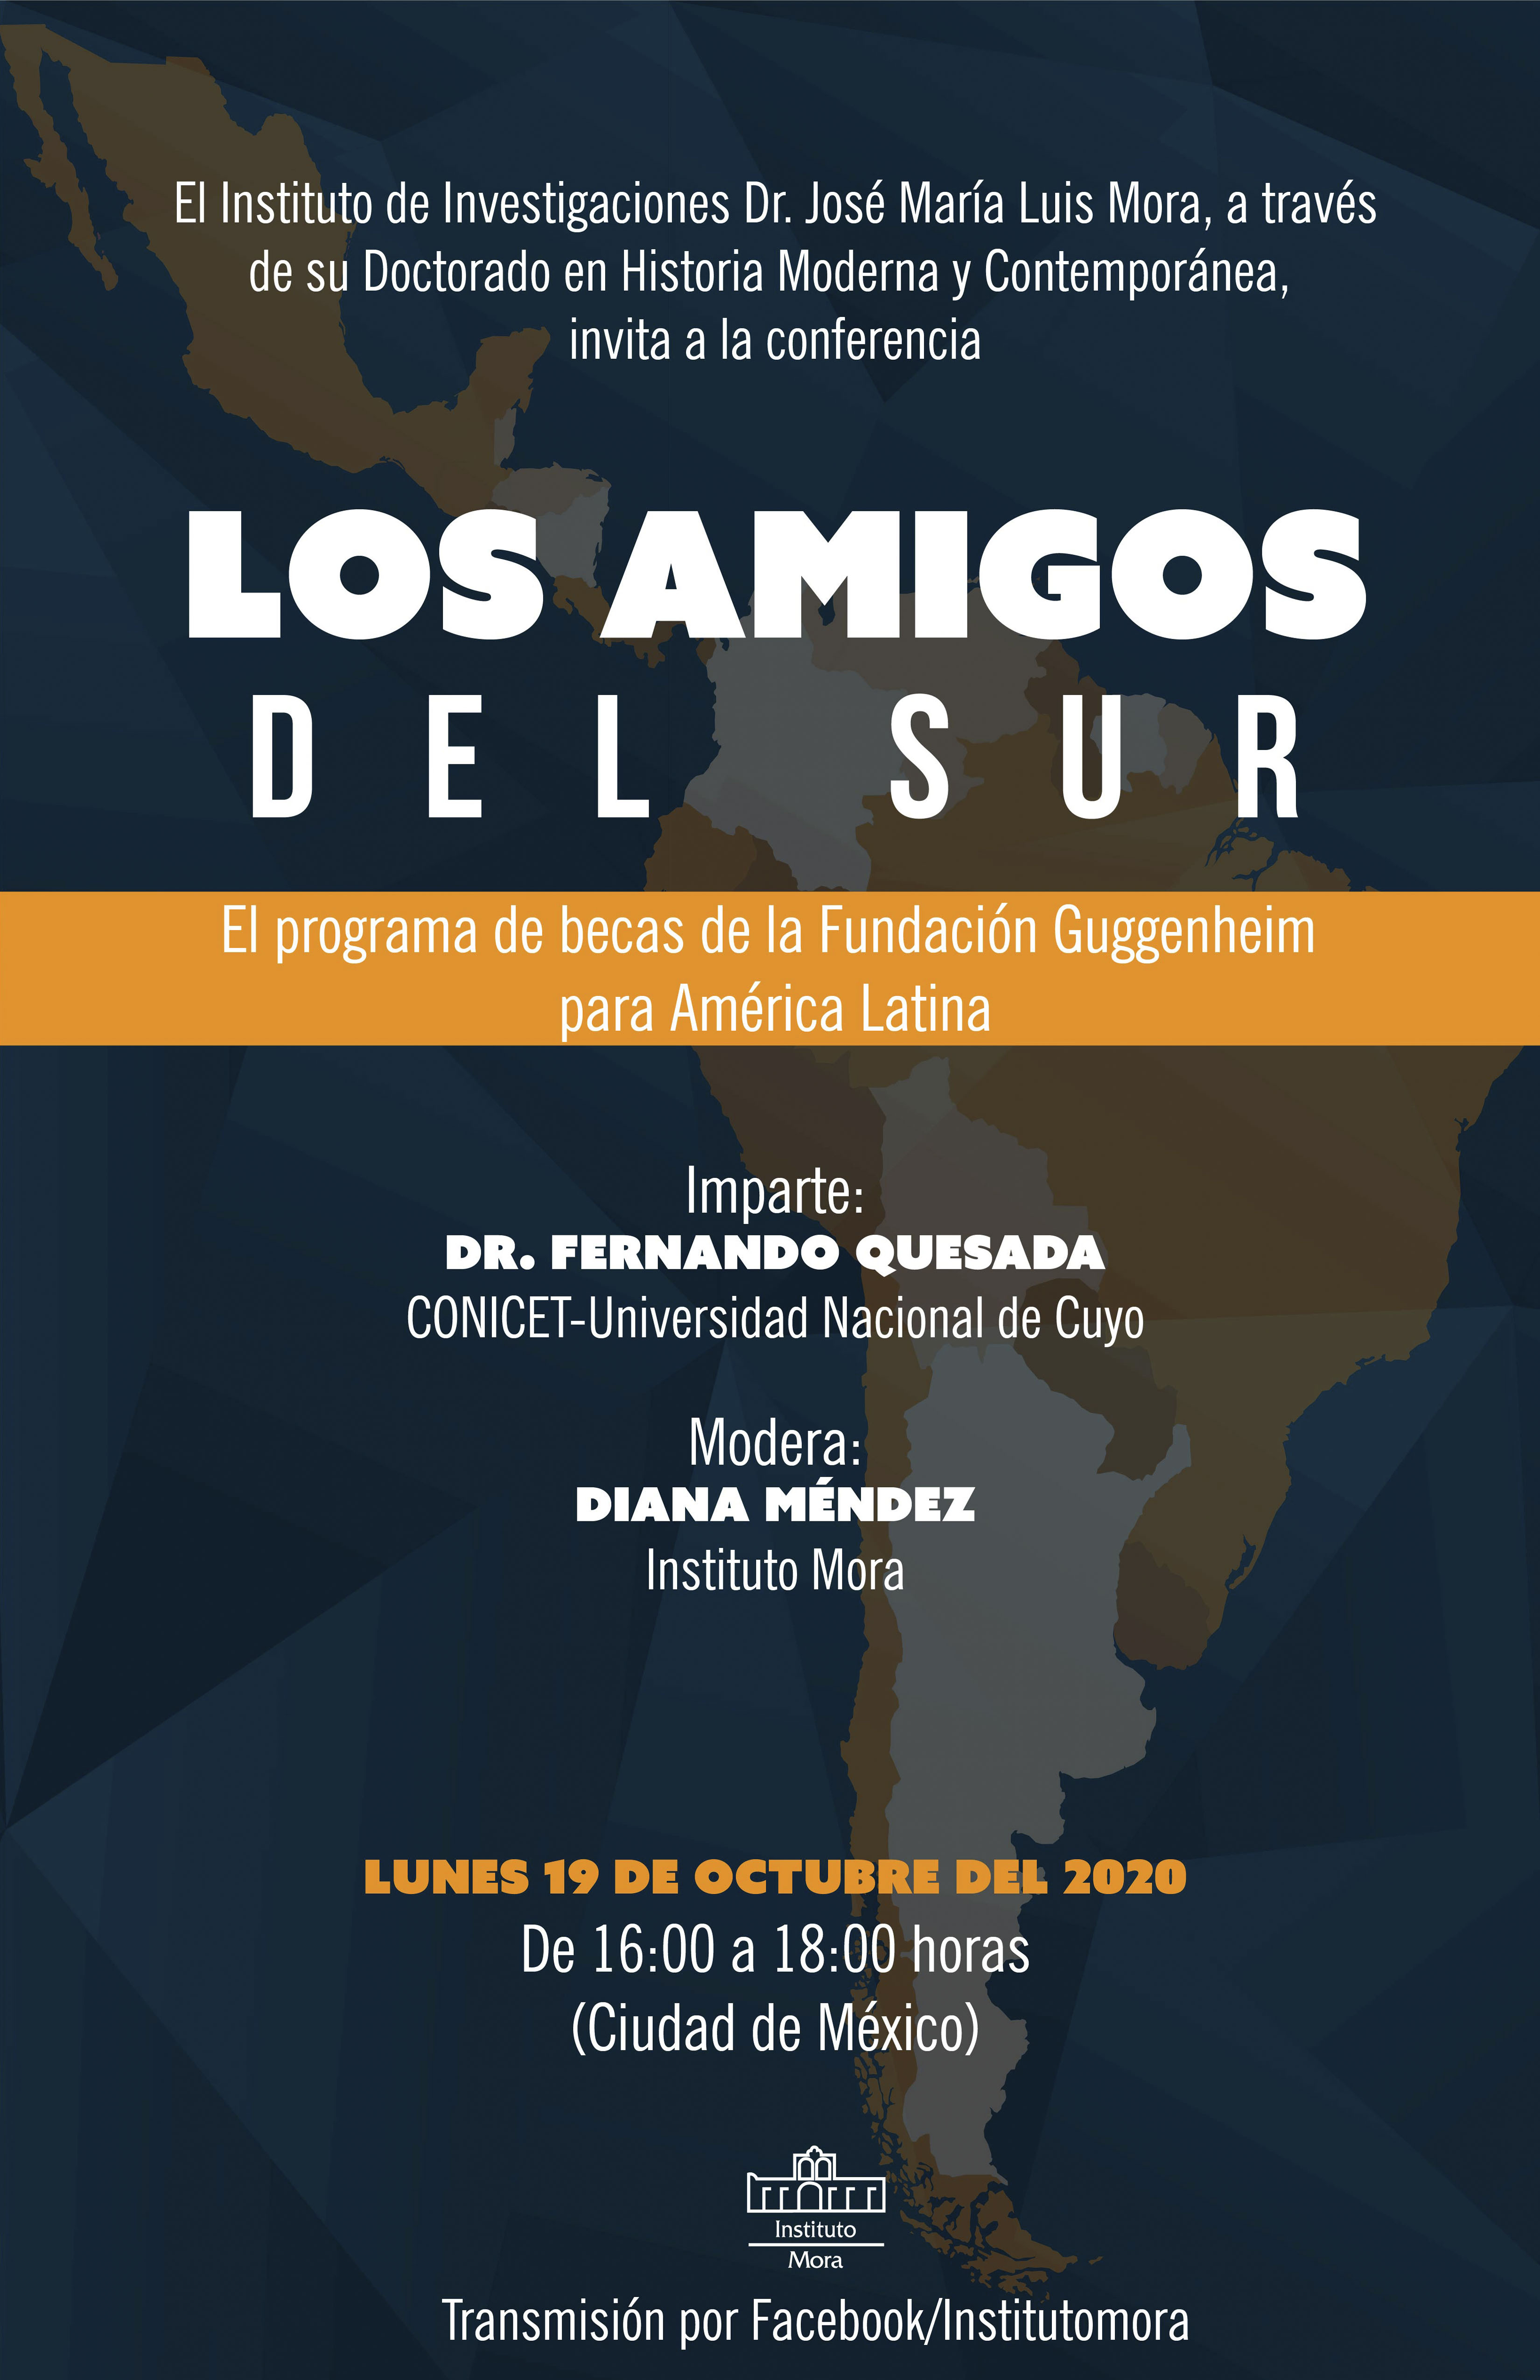 https://www.institutomora.edu.mx/Instituto/IE/1017_IEConf19-1020.jpg